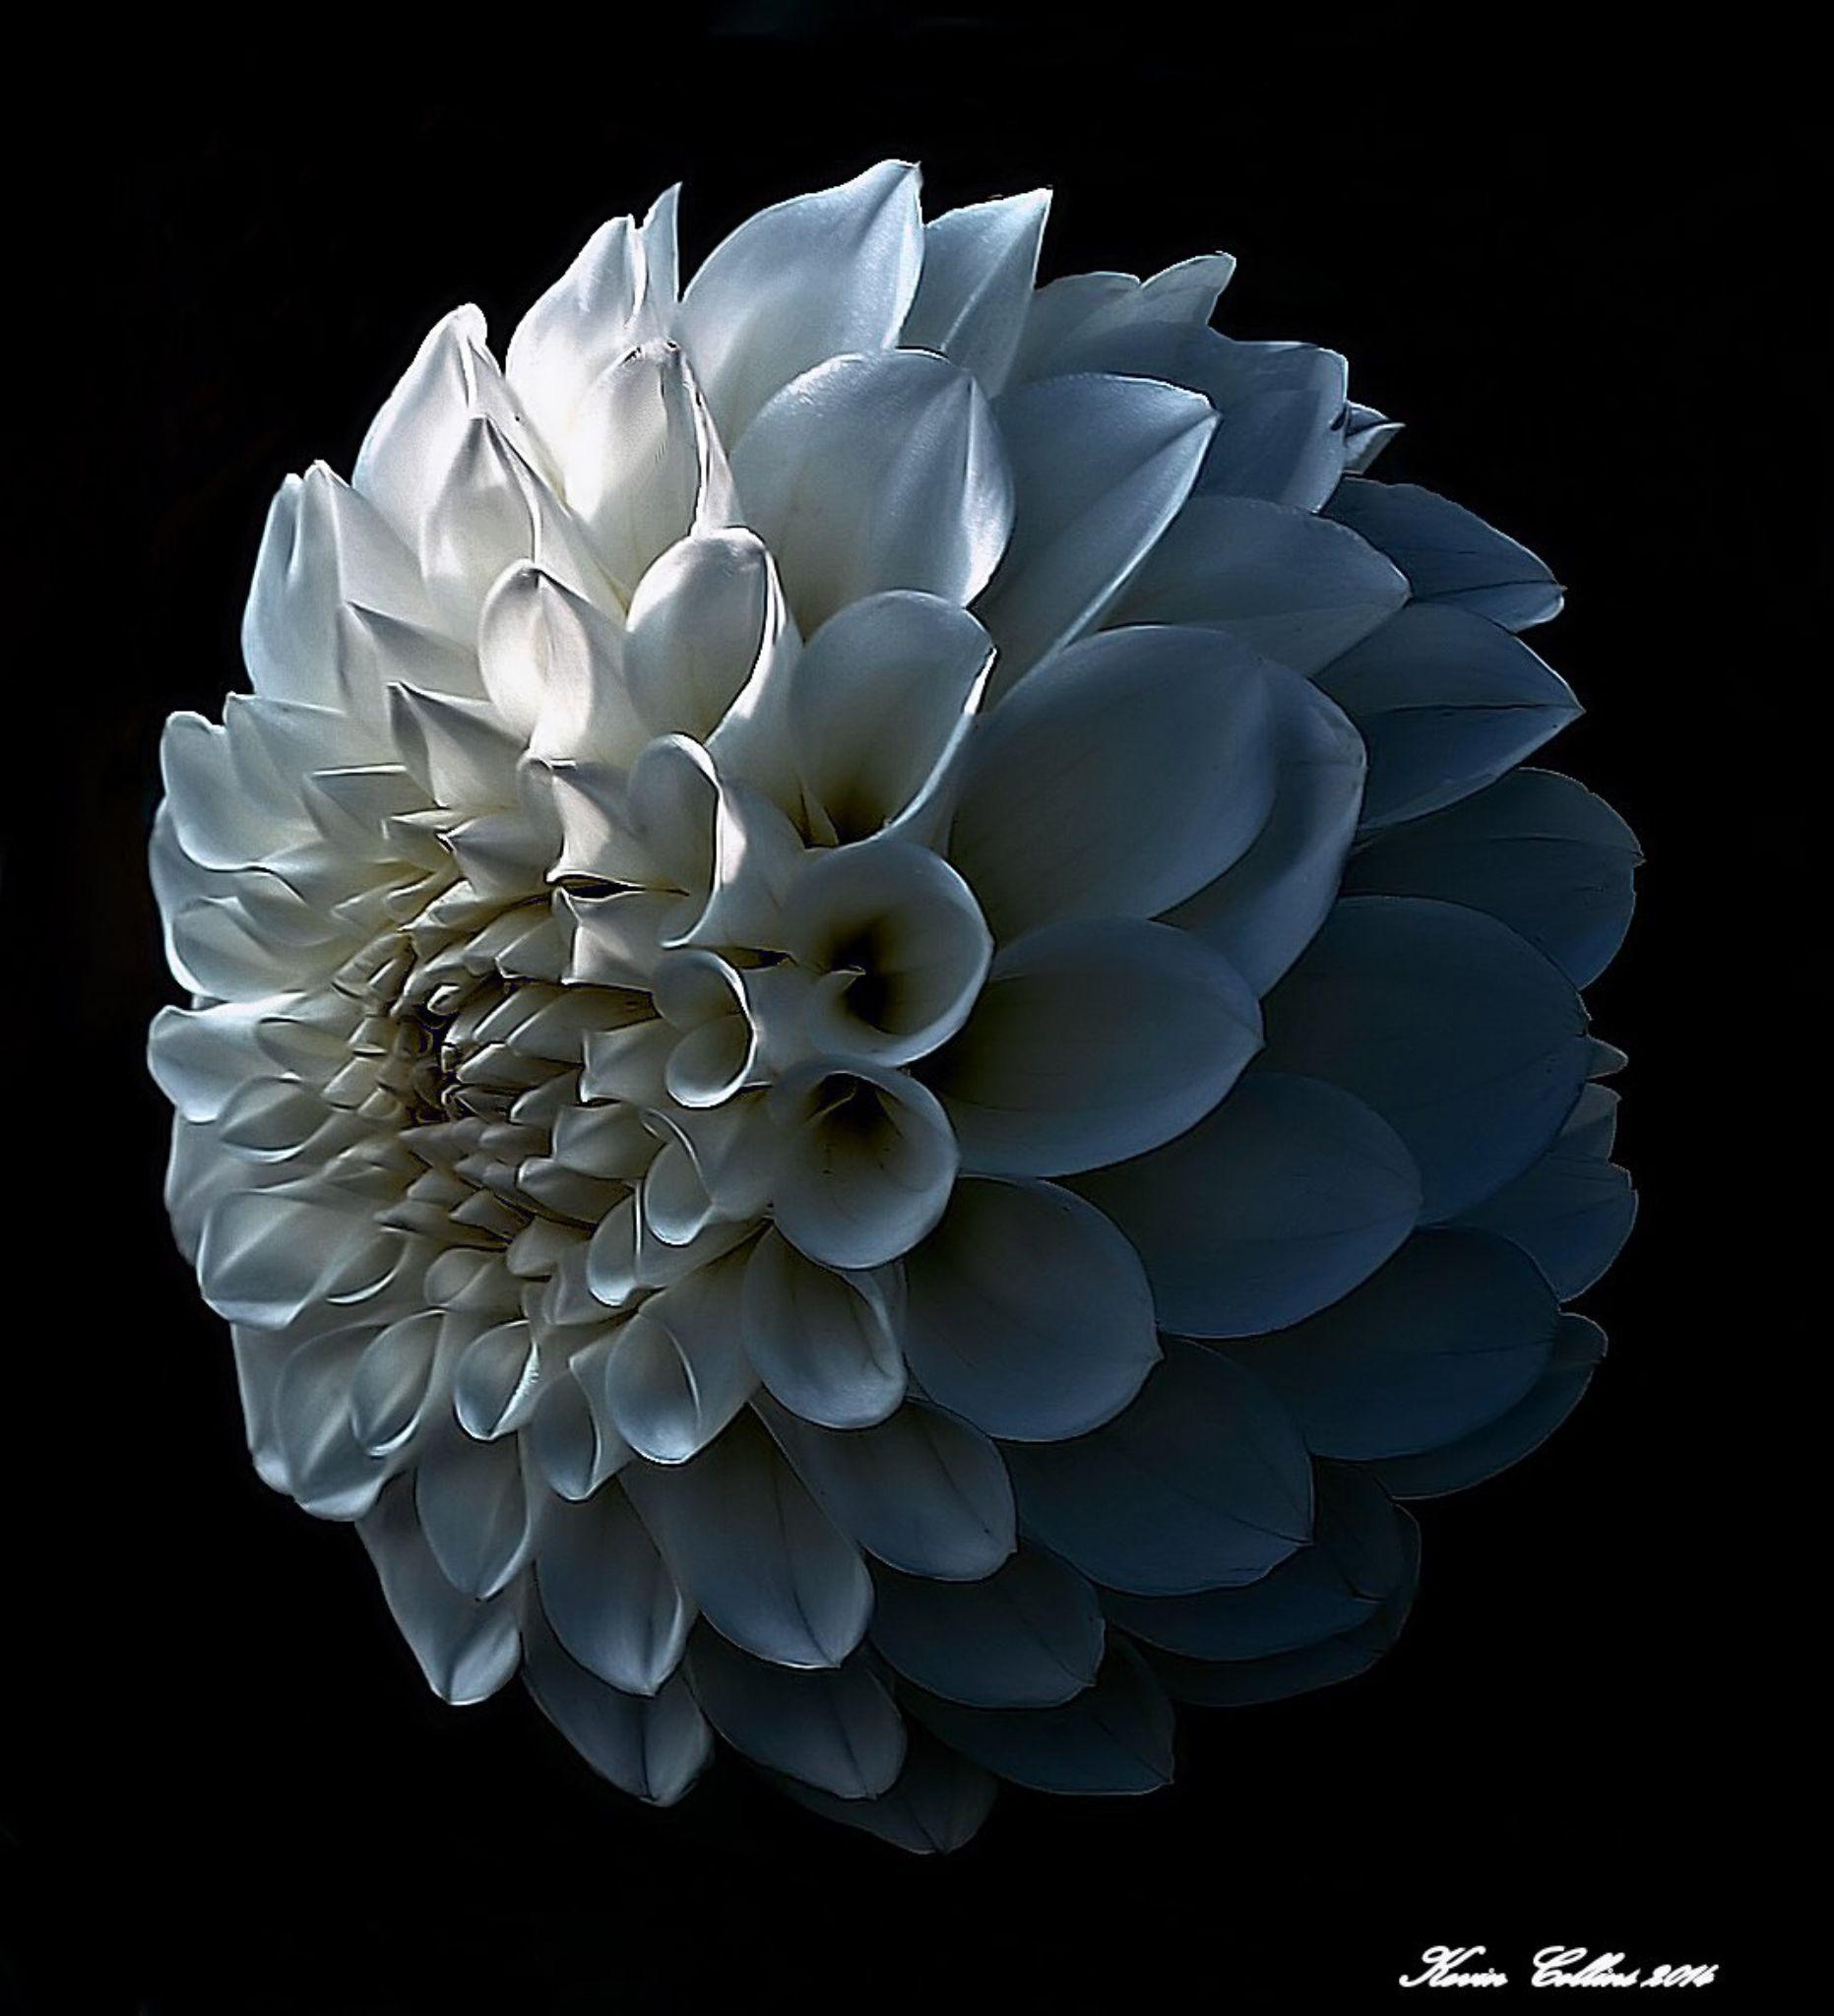 Bloom. by kevin.j.collins.92